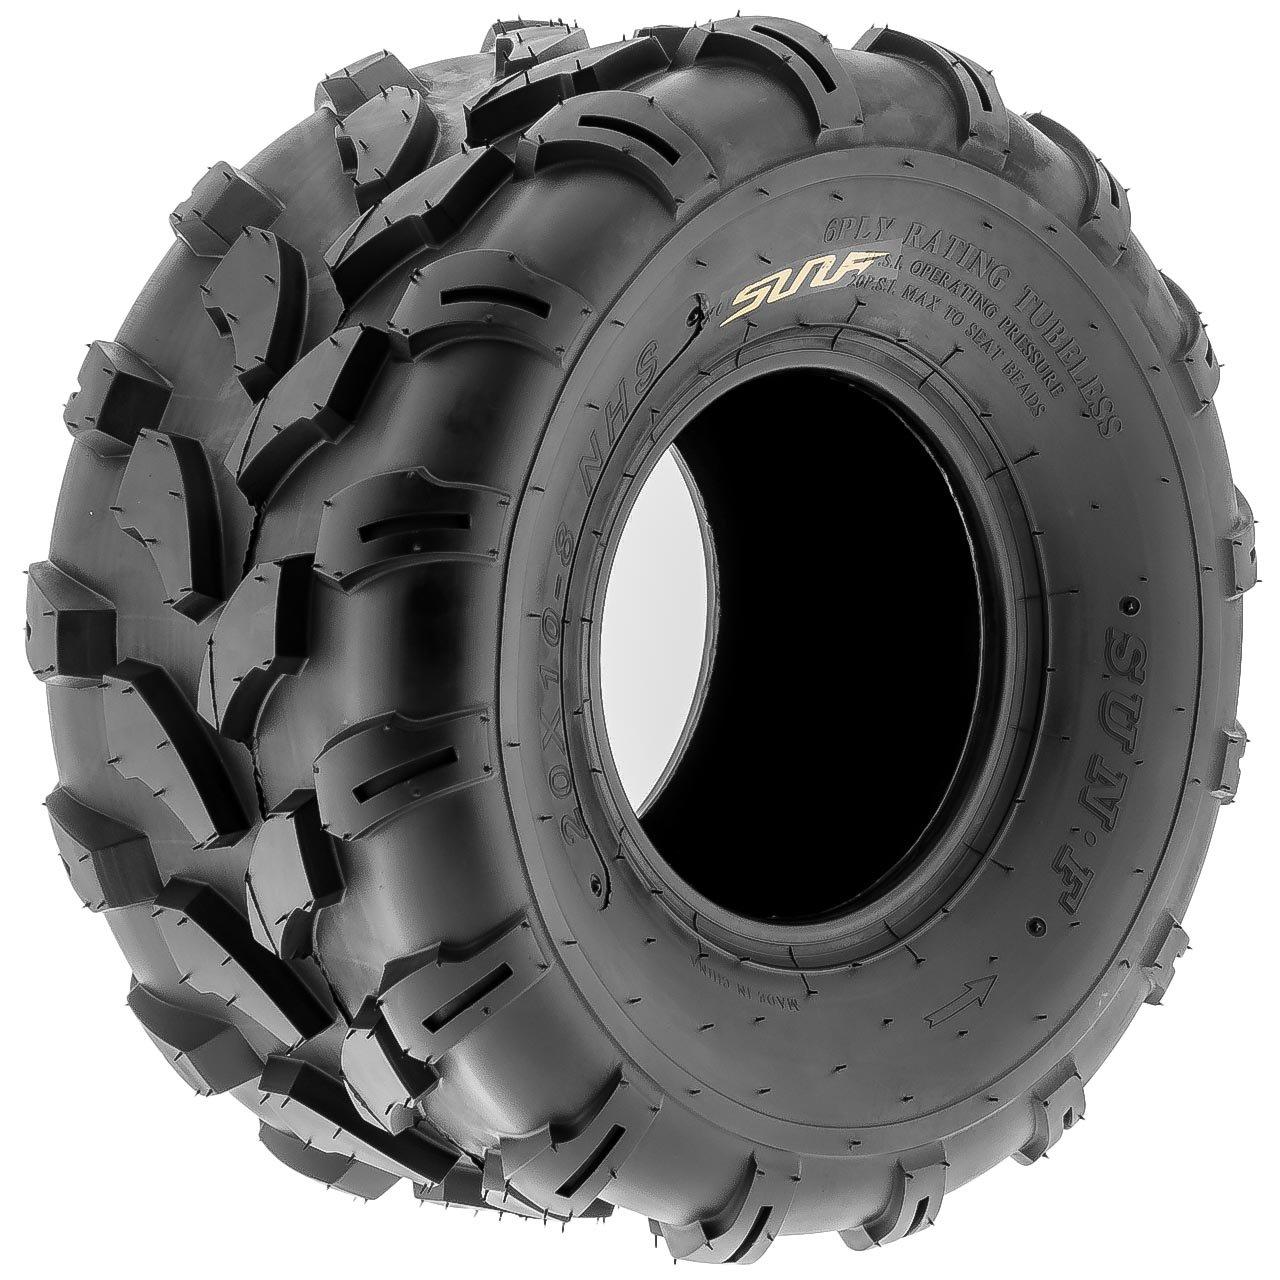 SunF A003 ATV/UTV/Lawn-Mowers Off-Road Tire 20x10-8, 6 PR, Directional Knobby Tread